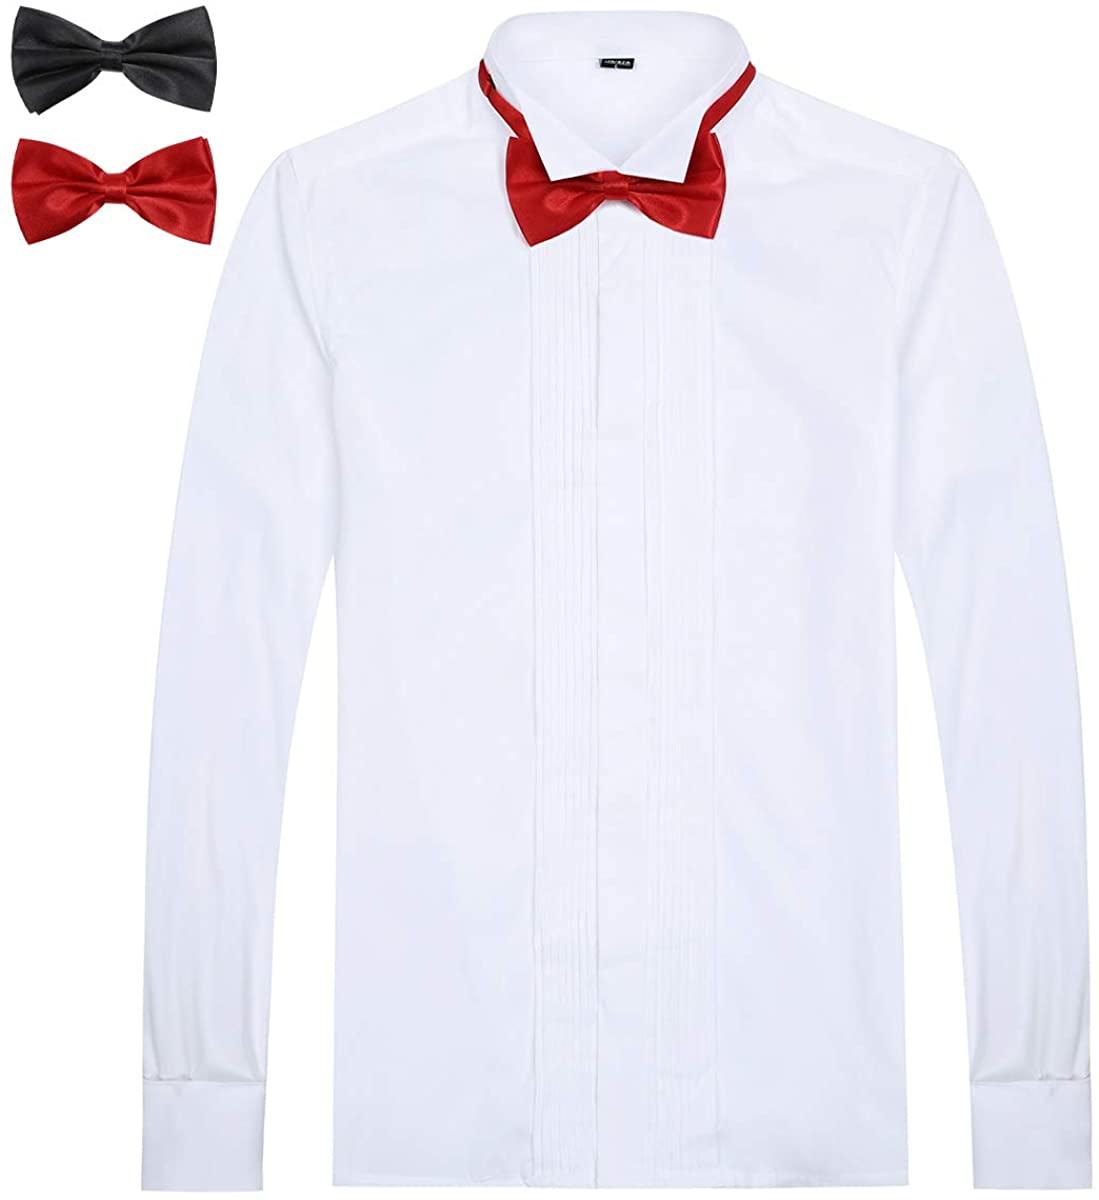 Allthemen Mens Dress Shirt Slim Fit Pleated Fold Down Collar Shirts Evening Wedding Tuxedo Dinner Shirts with Bow Tie